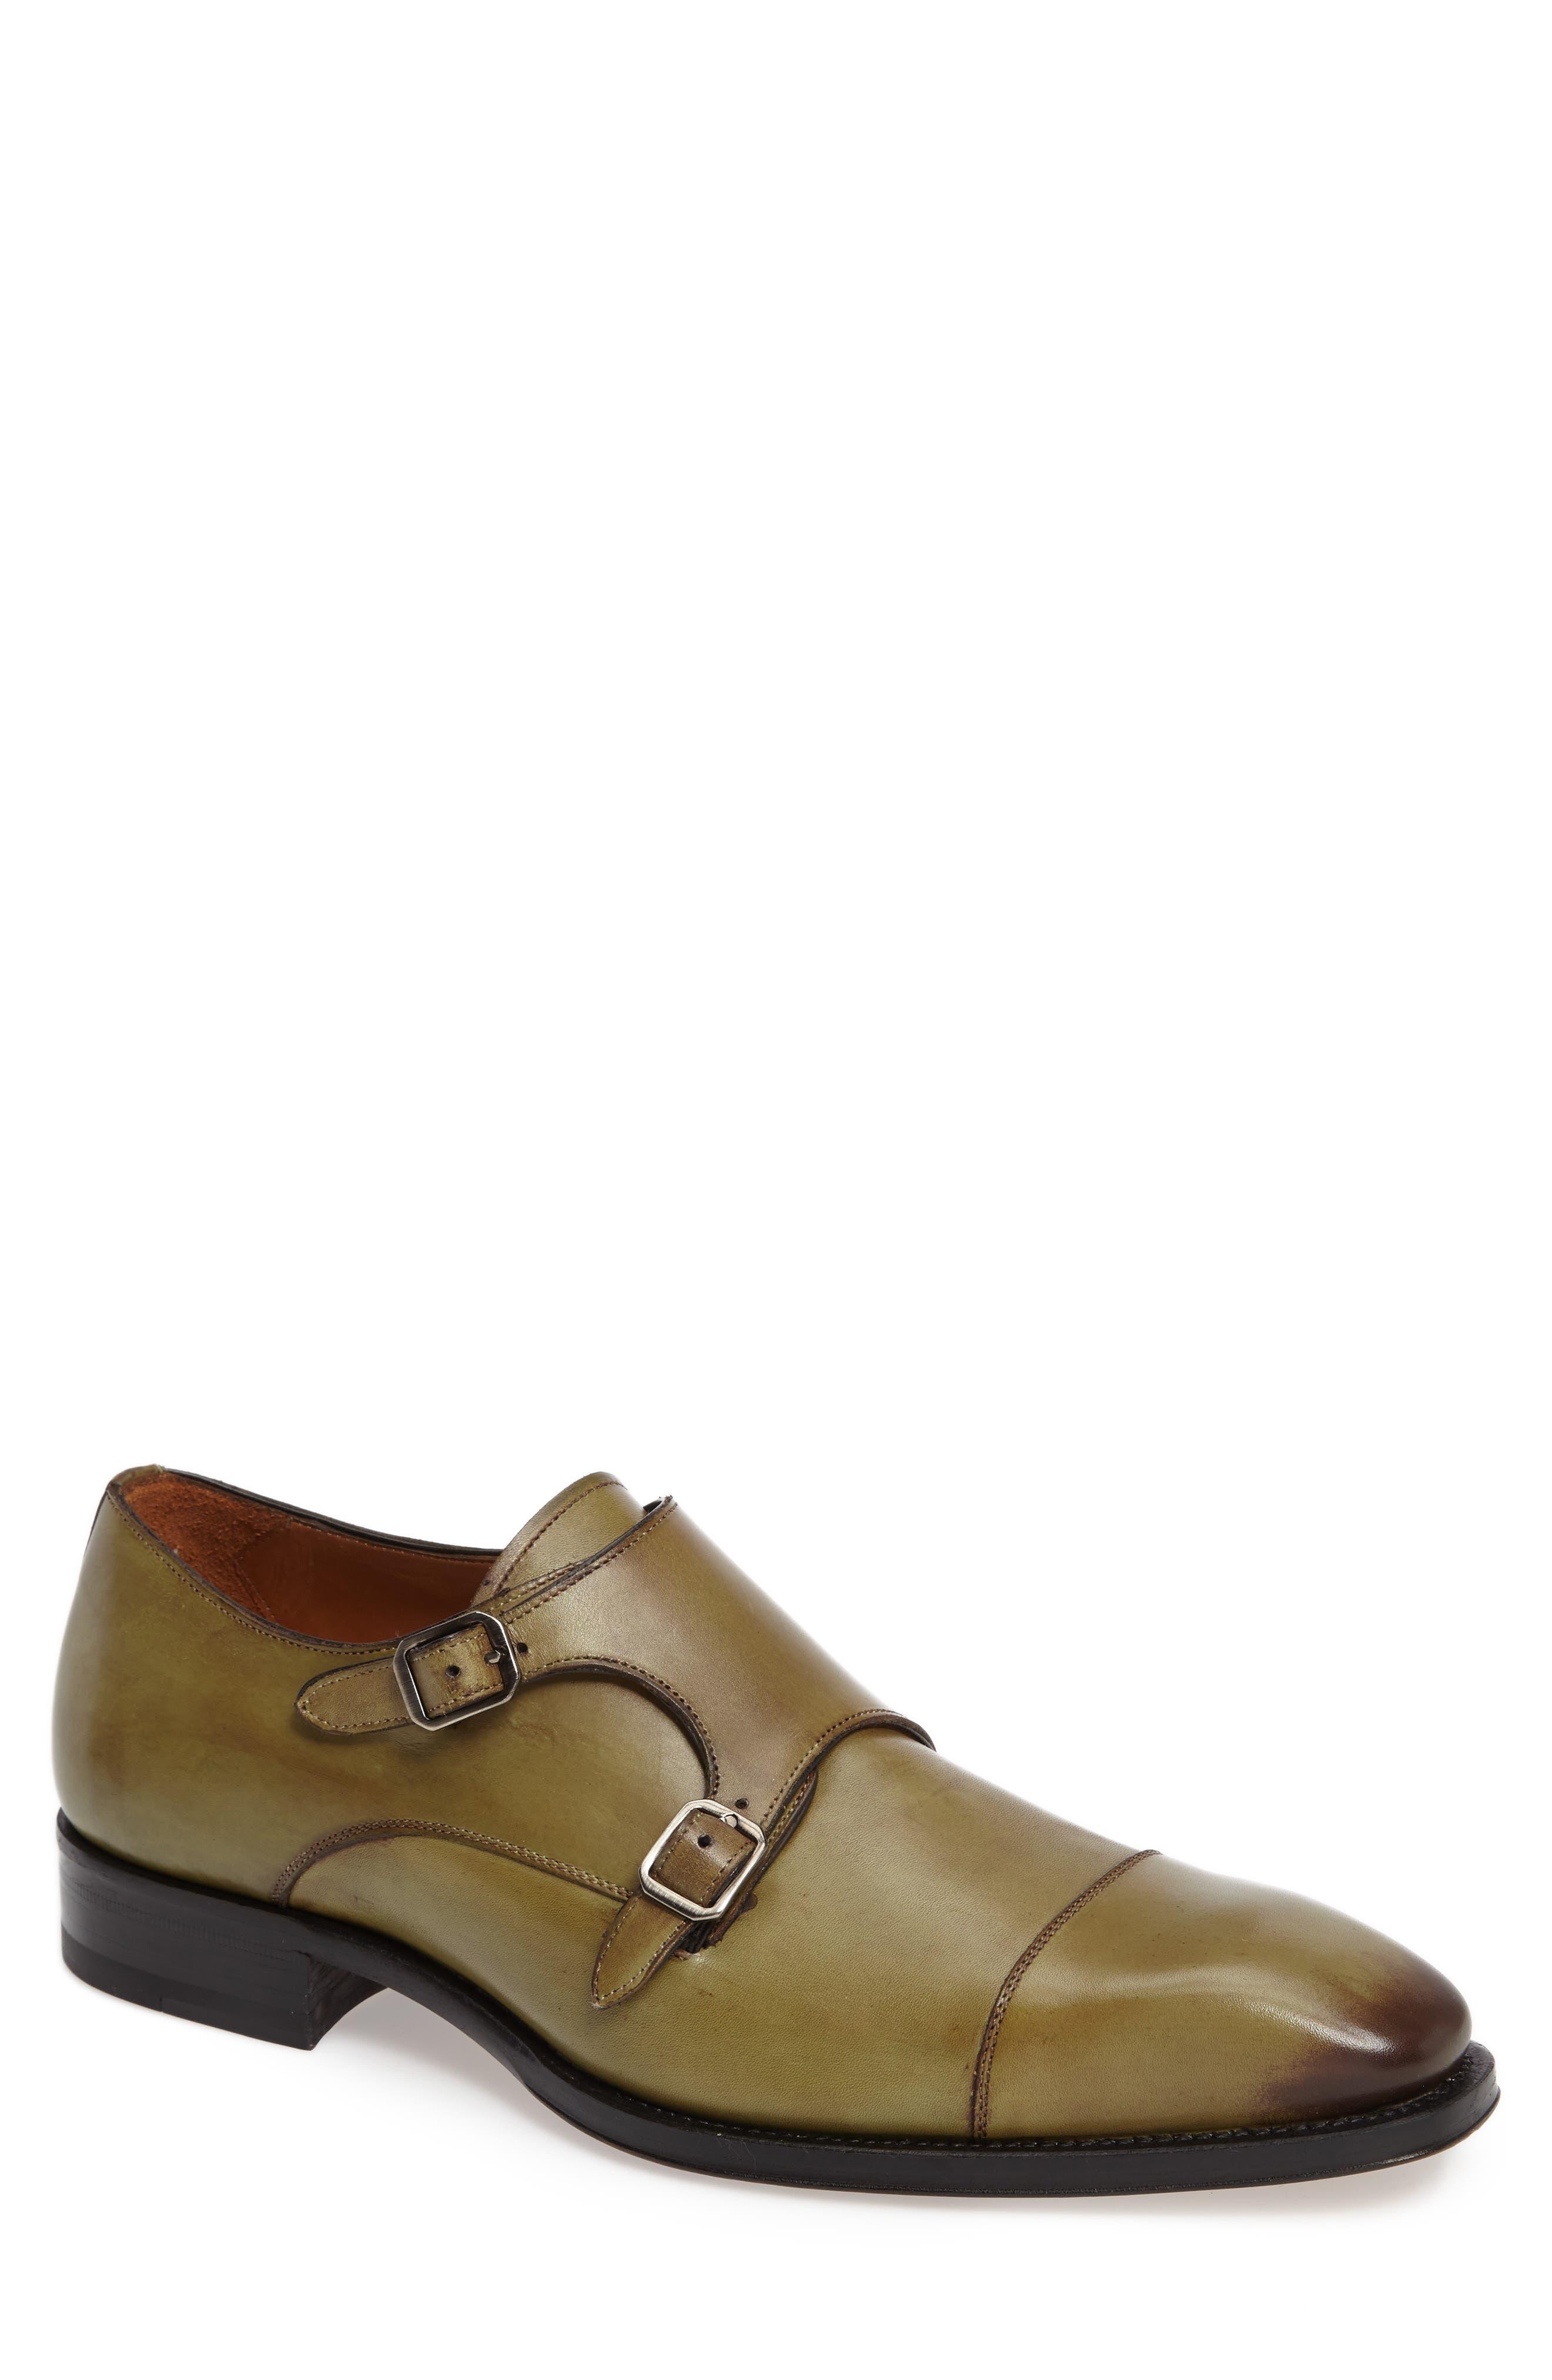 Alternate Image 1 Selected - Mezlan Cajal Double Monk Strap Cap Toe Shoe (Men)